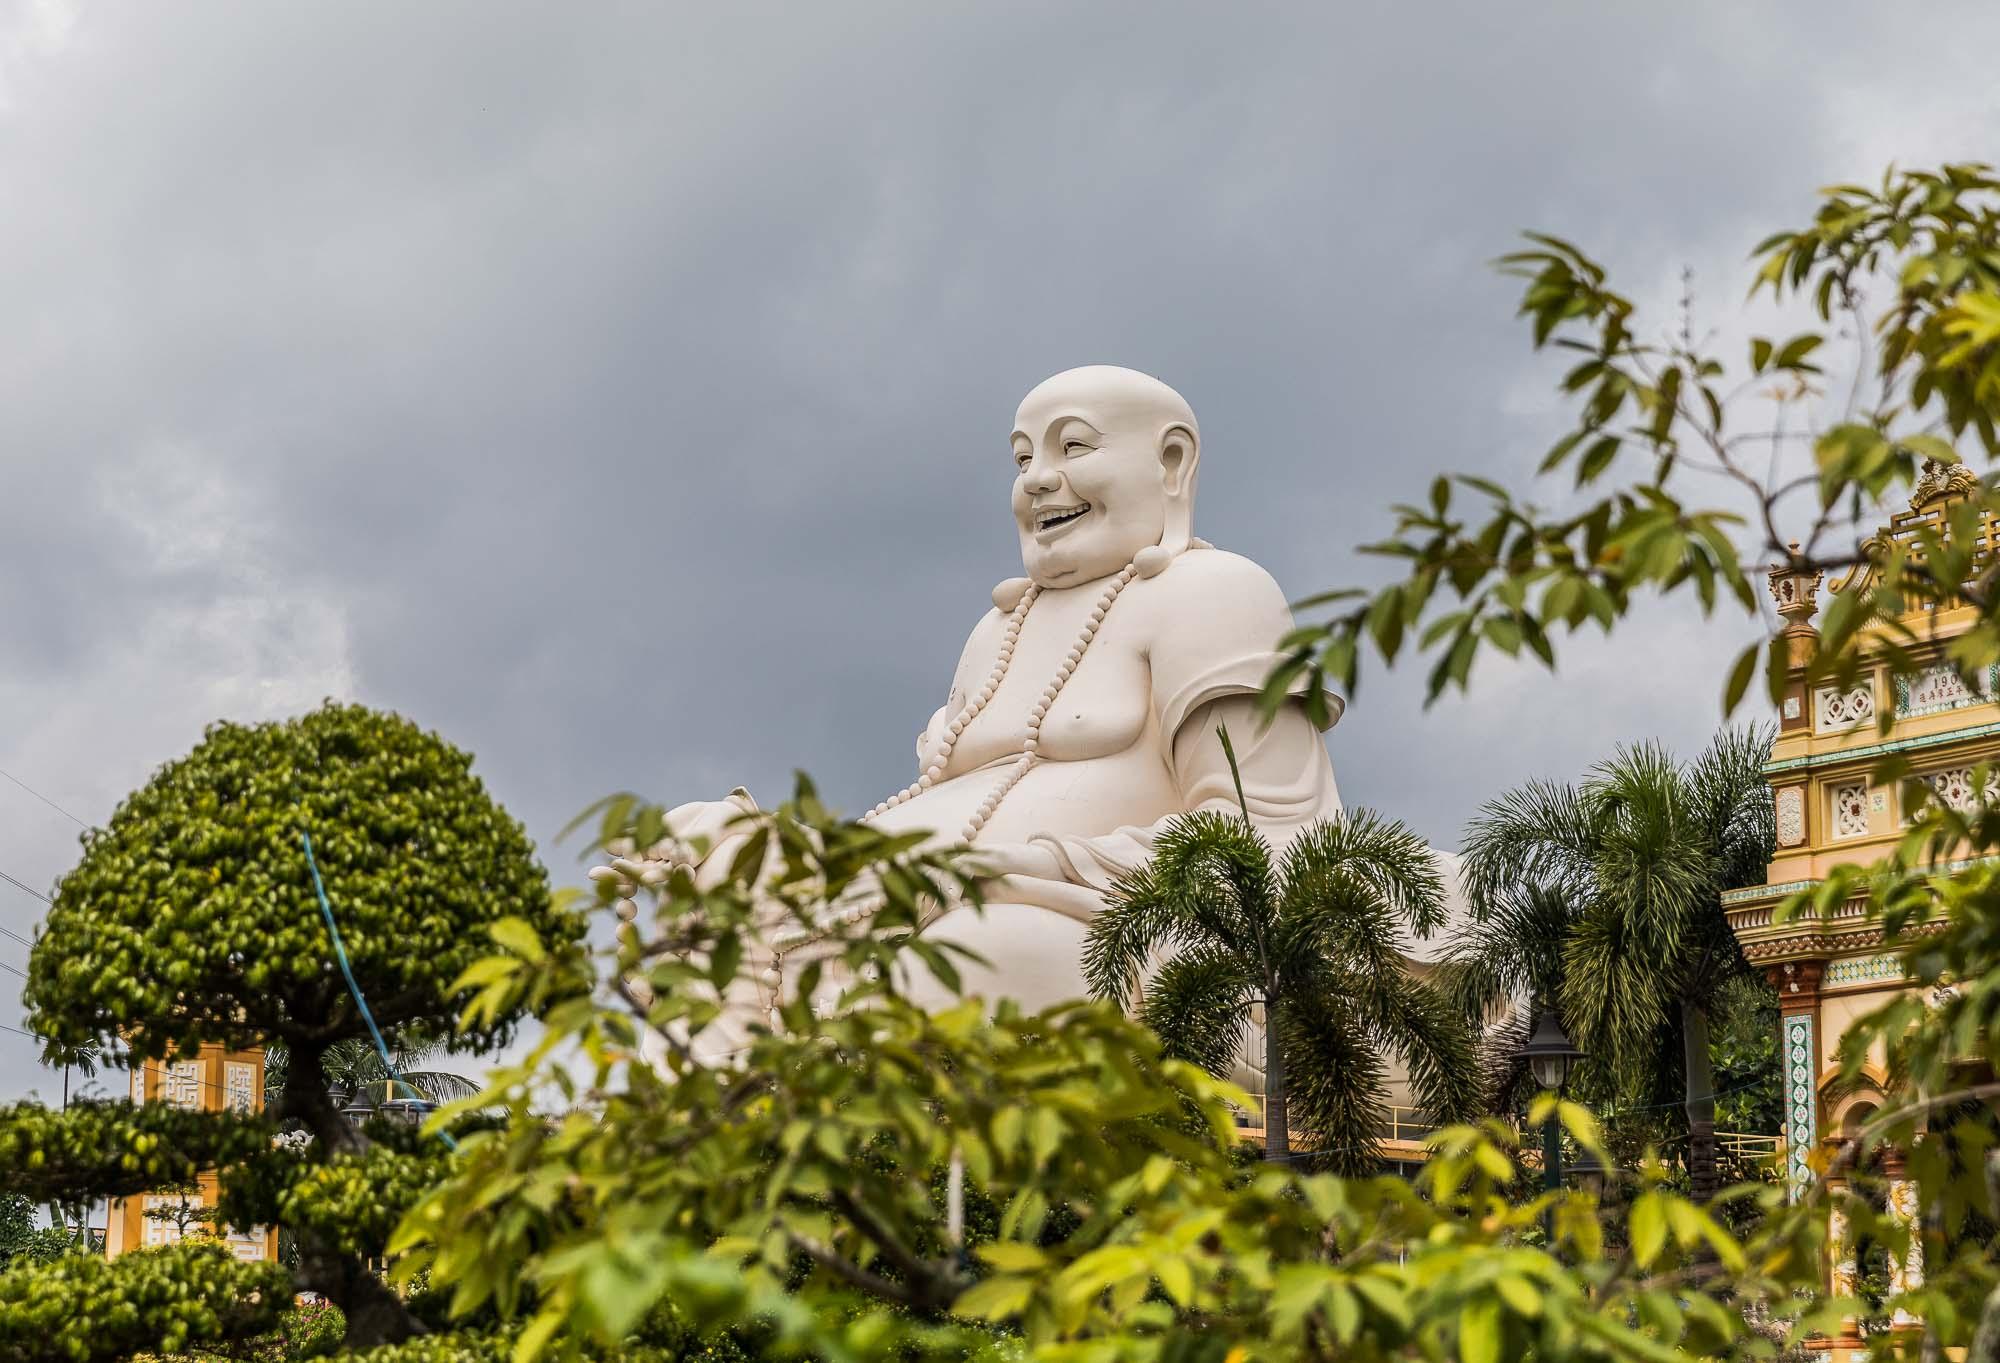 vietnam_2016_hcmc_jusmedic_191